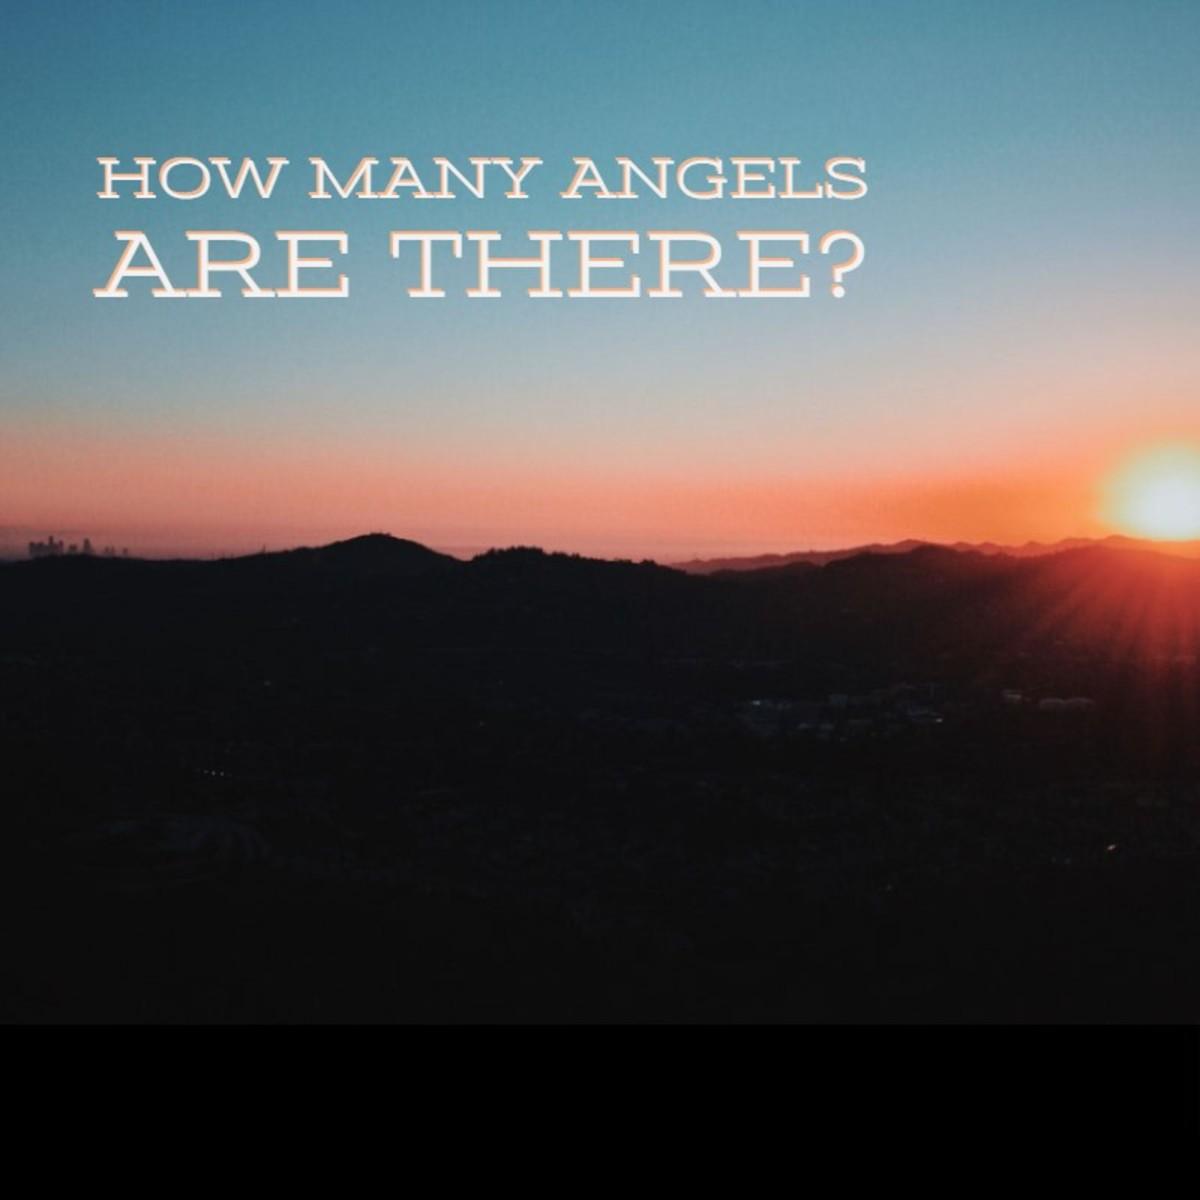 How many Angels did God create?